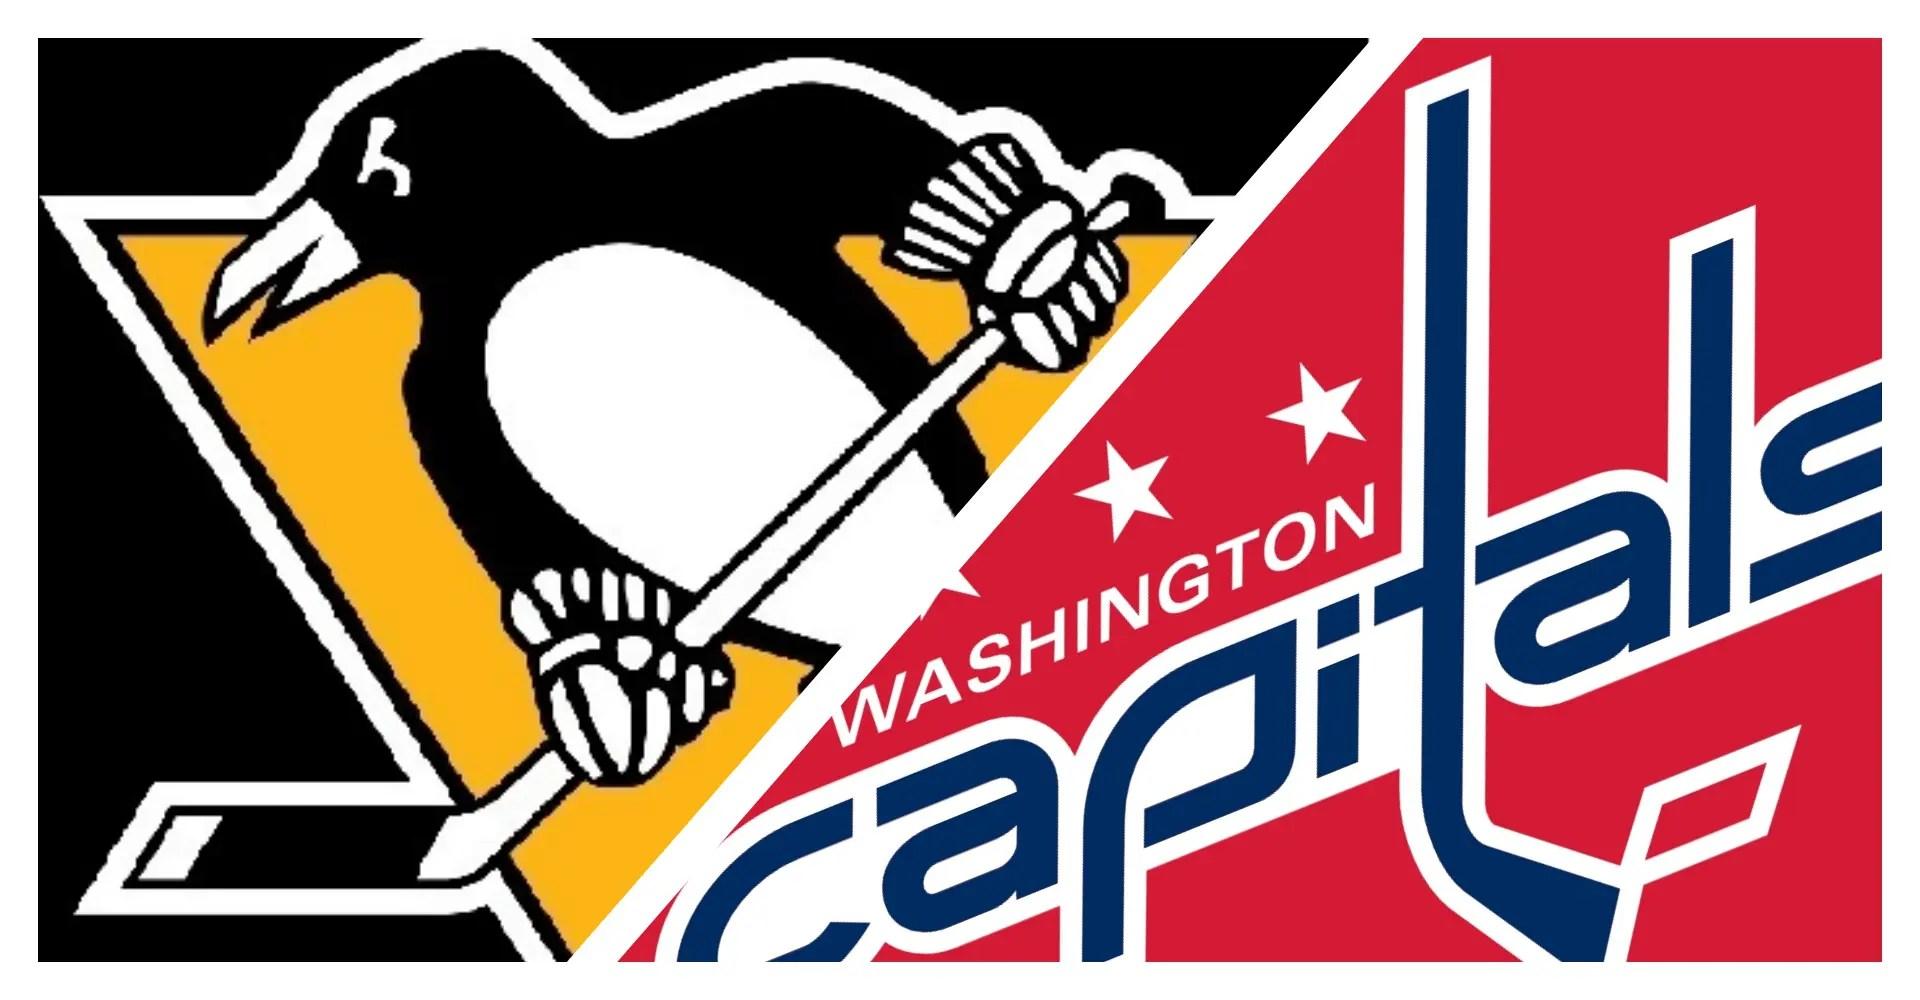 Washington Capitals vs. Pittsburgh Penguins 03/07/20 Odds Pick & Prediction